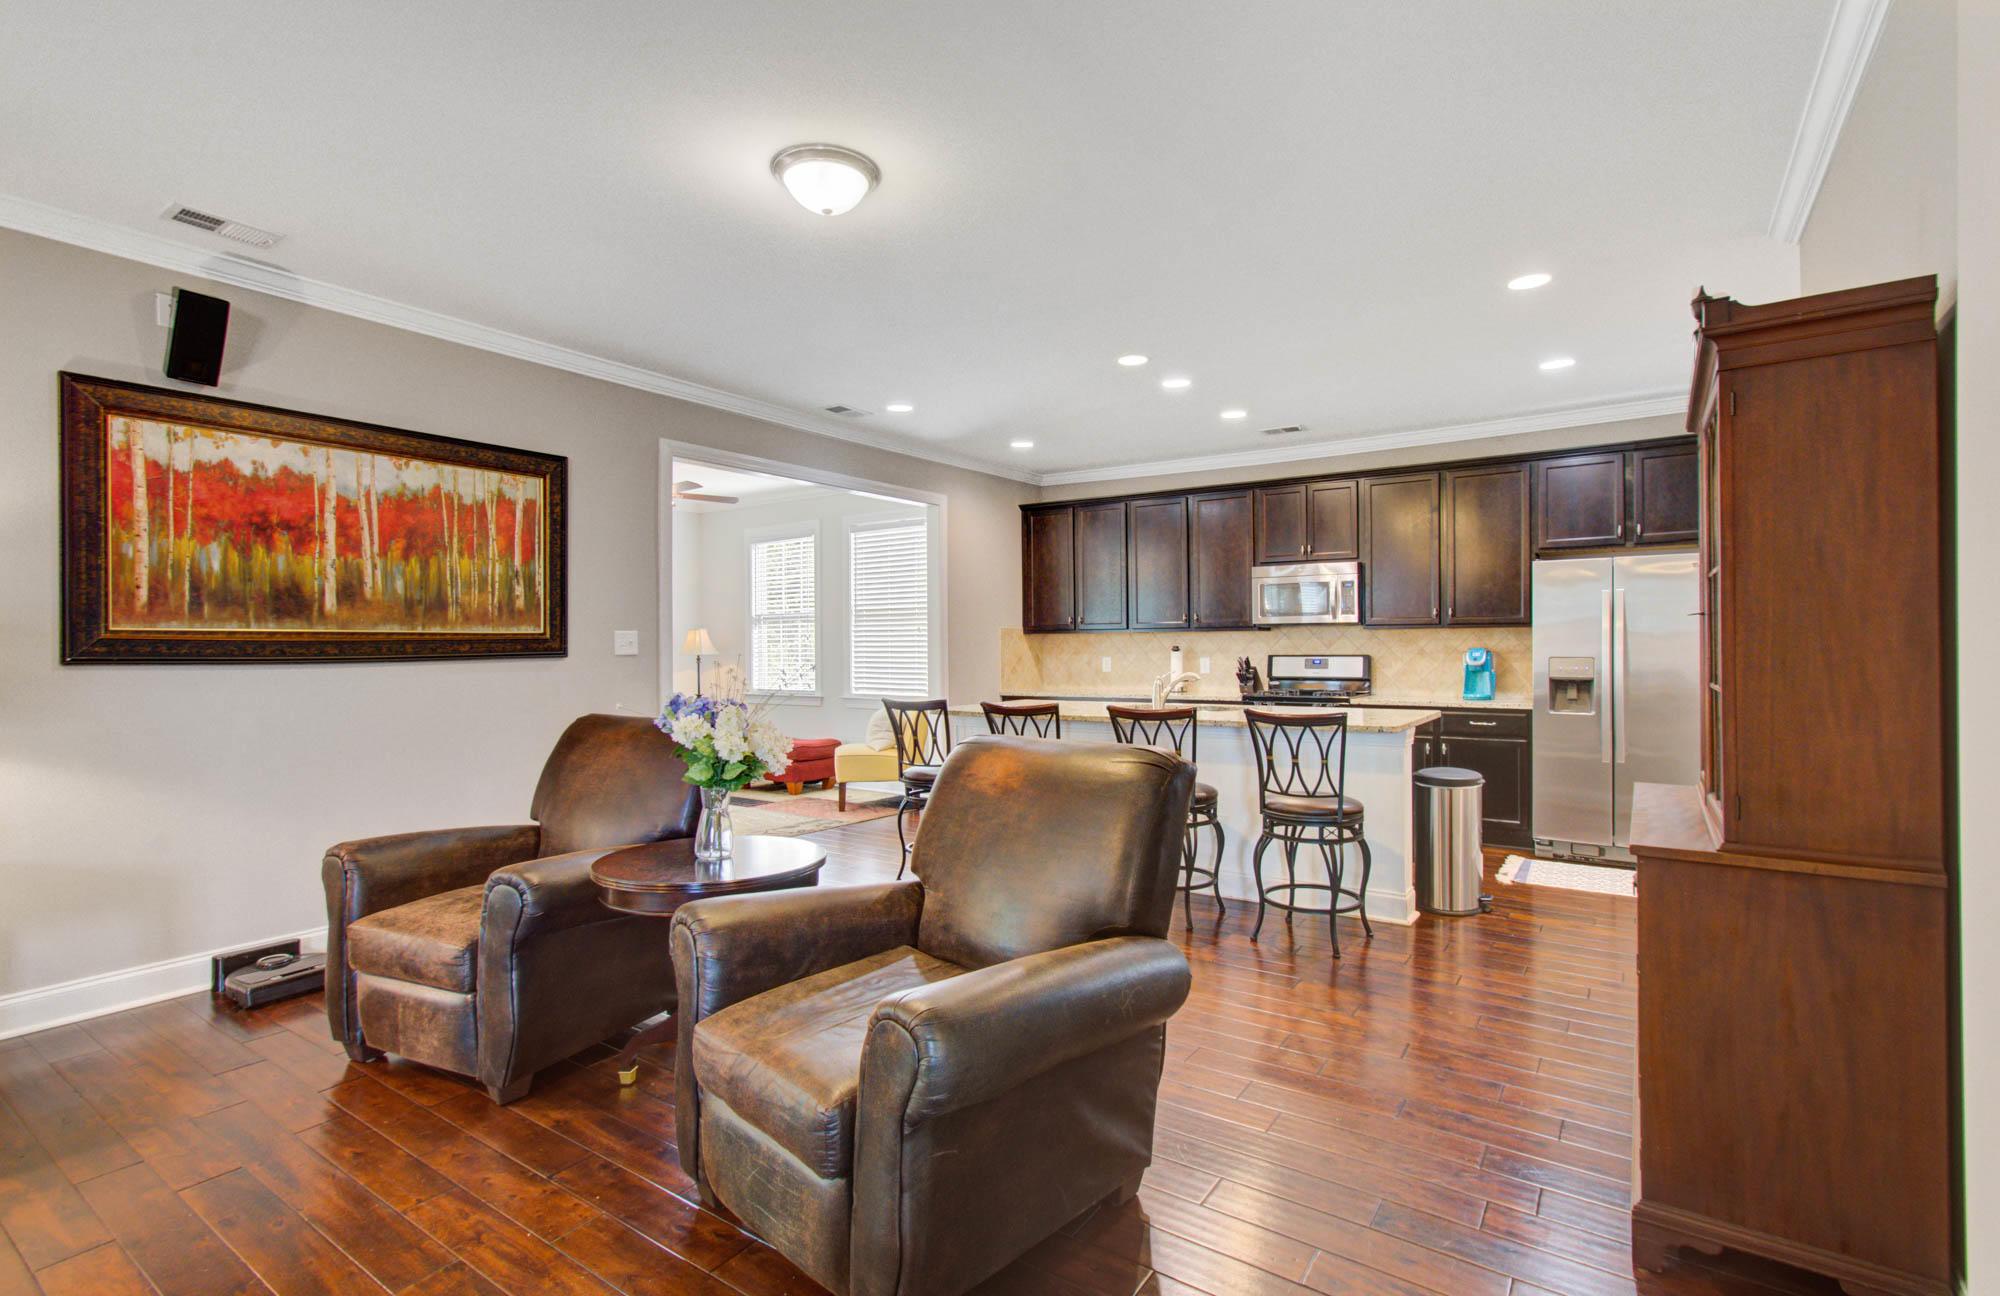 Indigo Palms Homes For Sale - 8535 Majestic, North Charleston, SC - 33